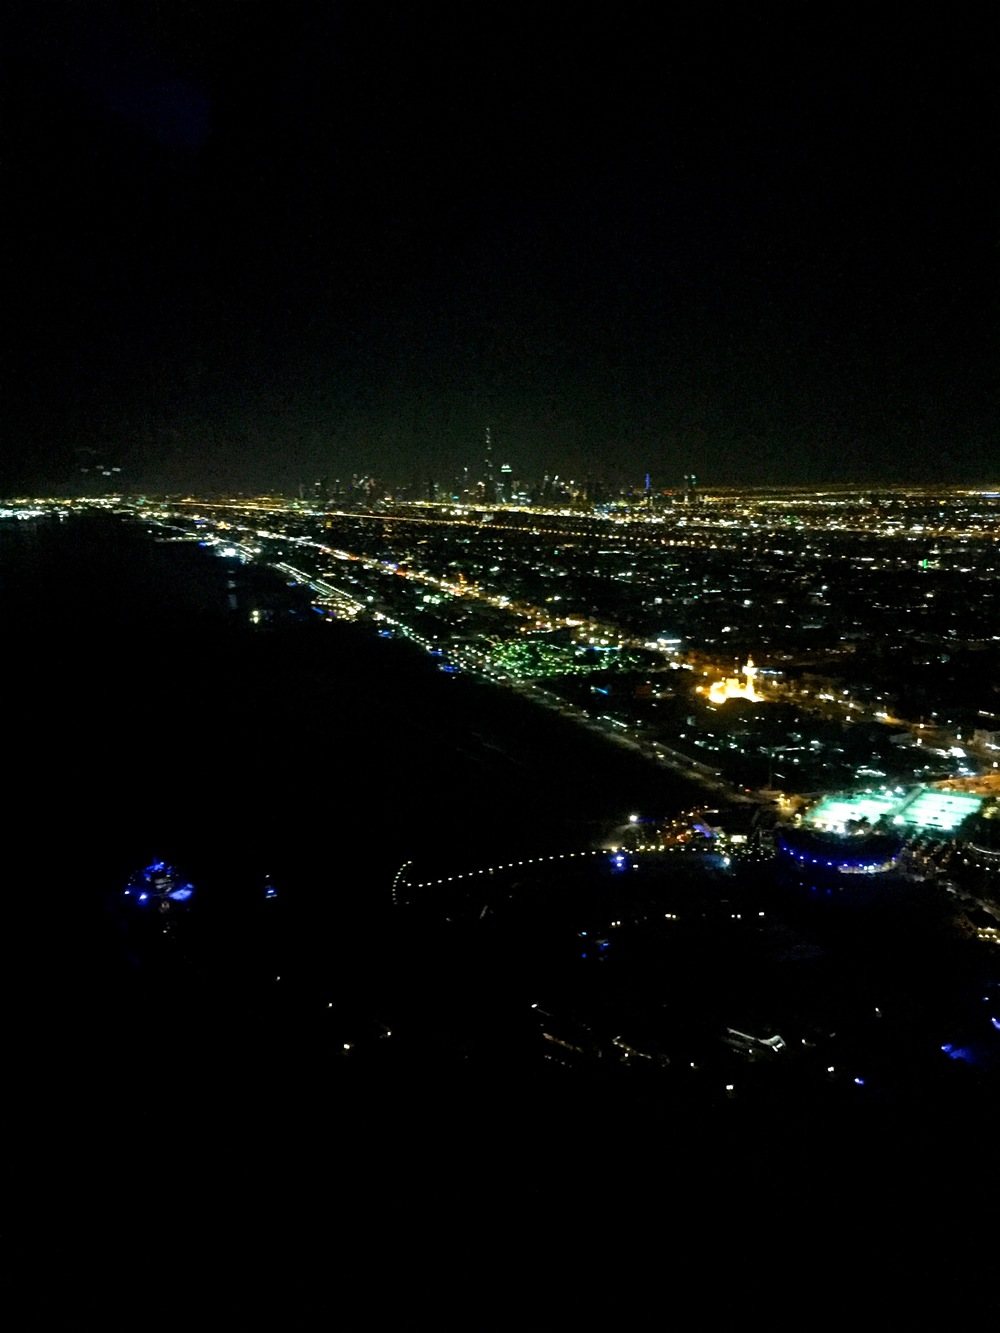 Teri_Dubai_Travels_spiritedtable_photo.06.jpg